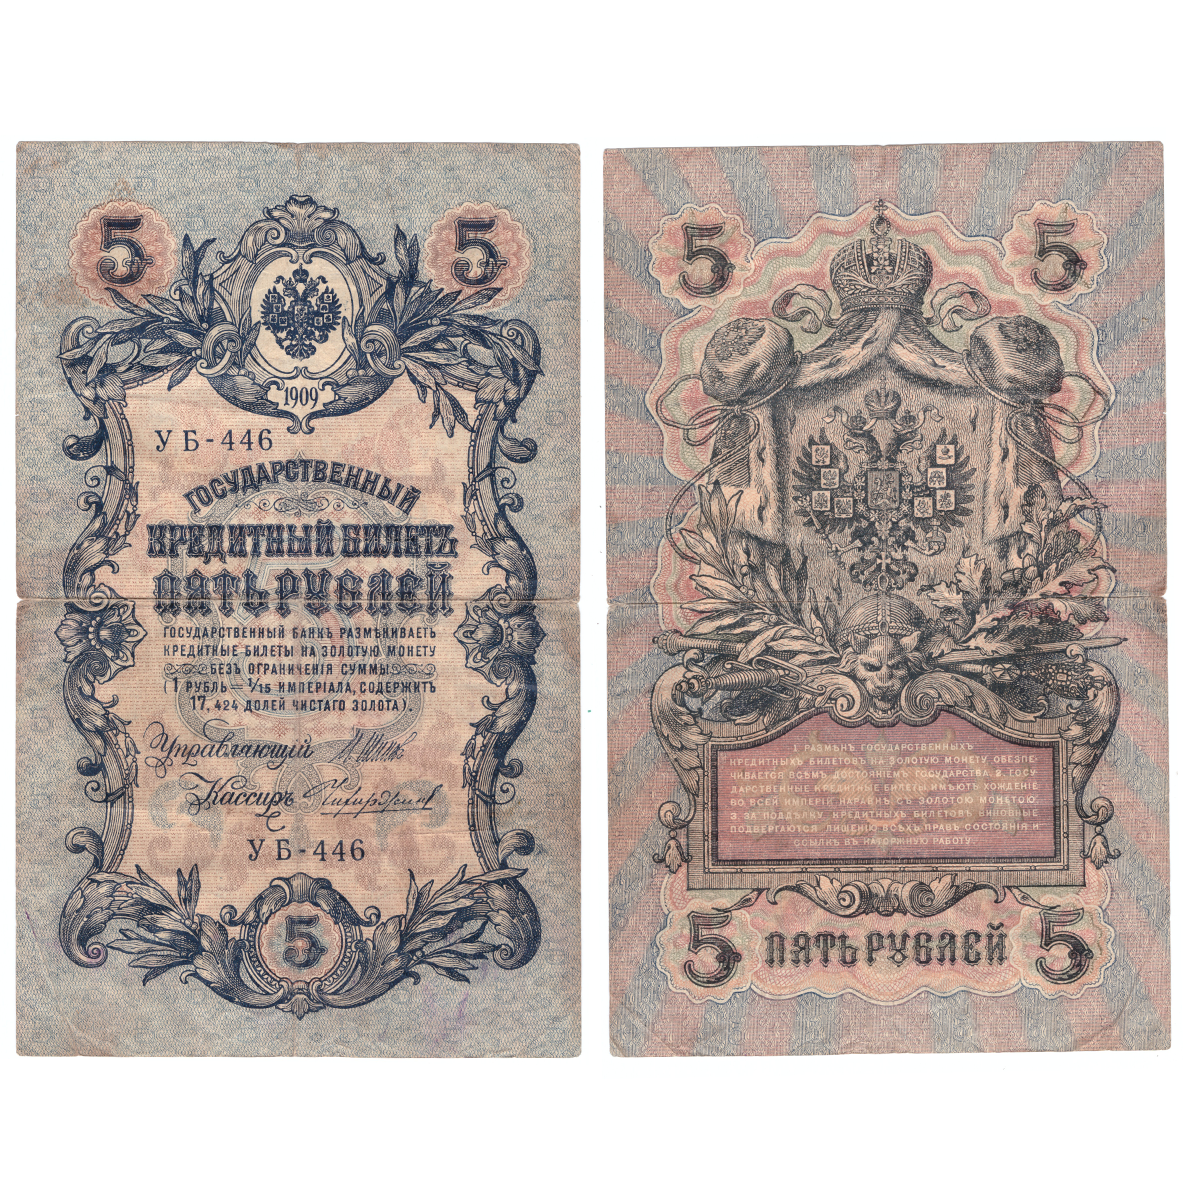 5 рублей 1909 г. Шипов Чихиржин. Короткий номер №. УБ-446. F-